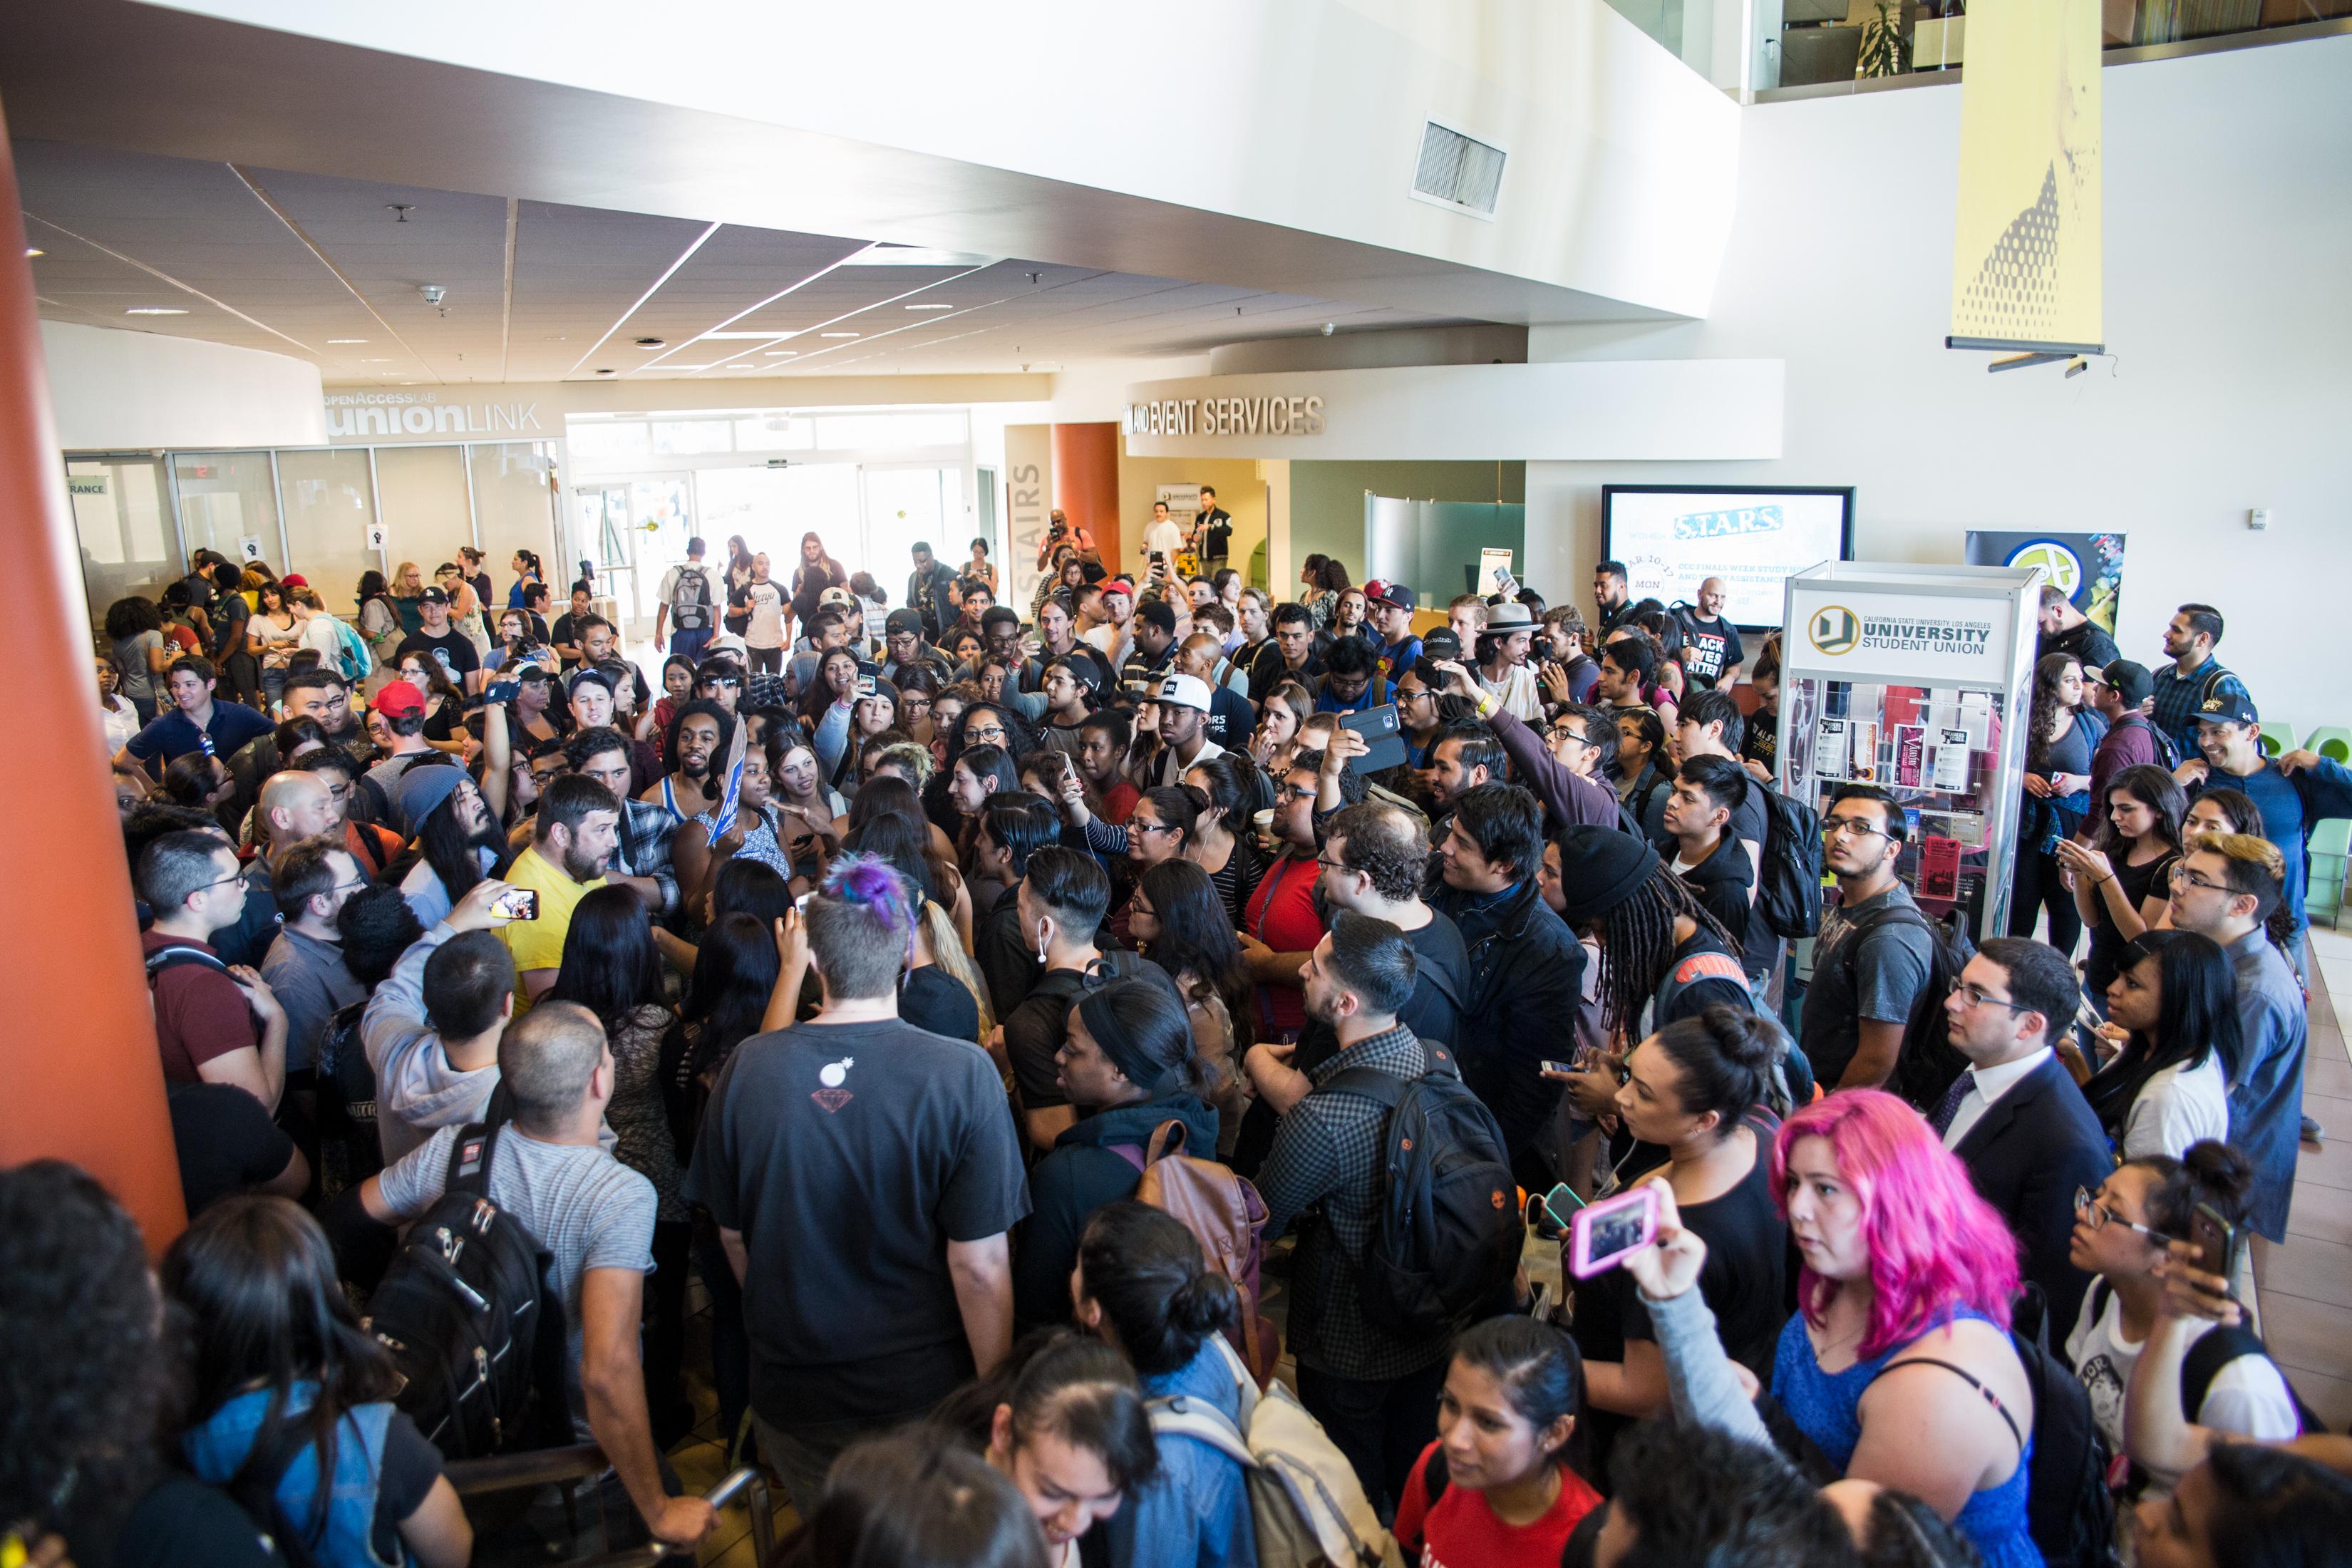 assault-on-conservative-speakers-at-American-universities.jpg